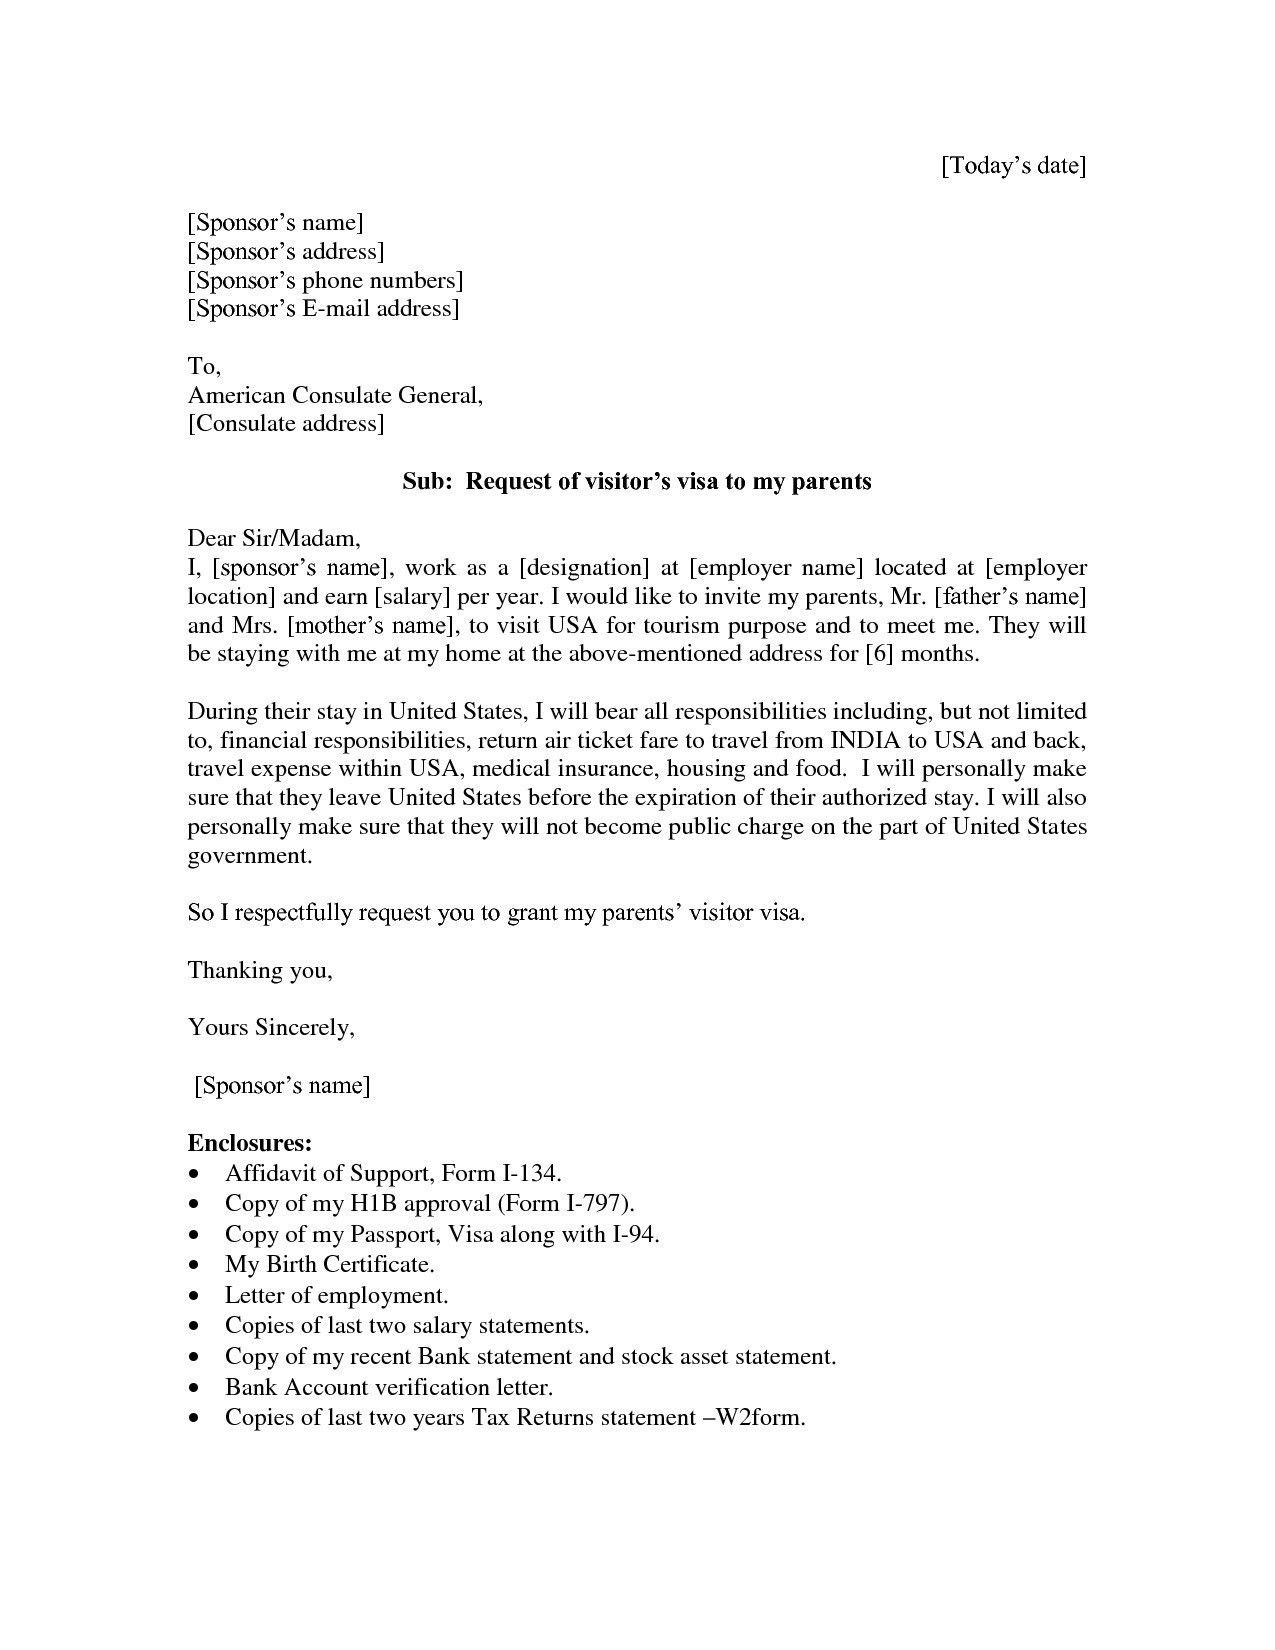 sle invitation letter for visitor visa parents new